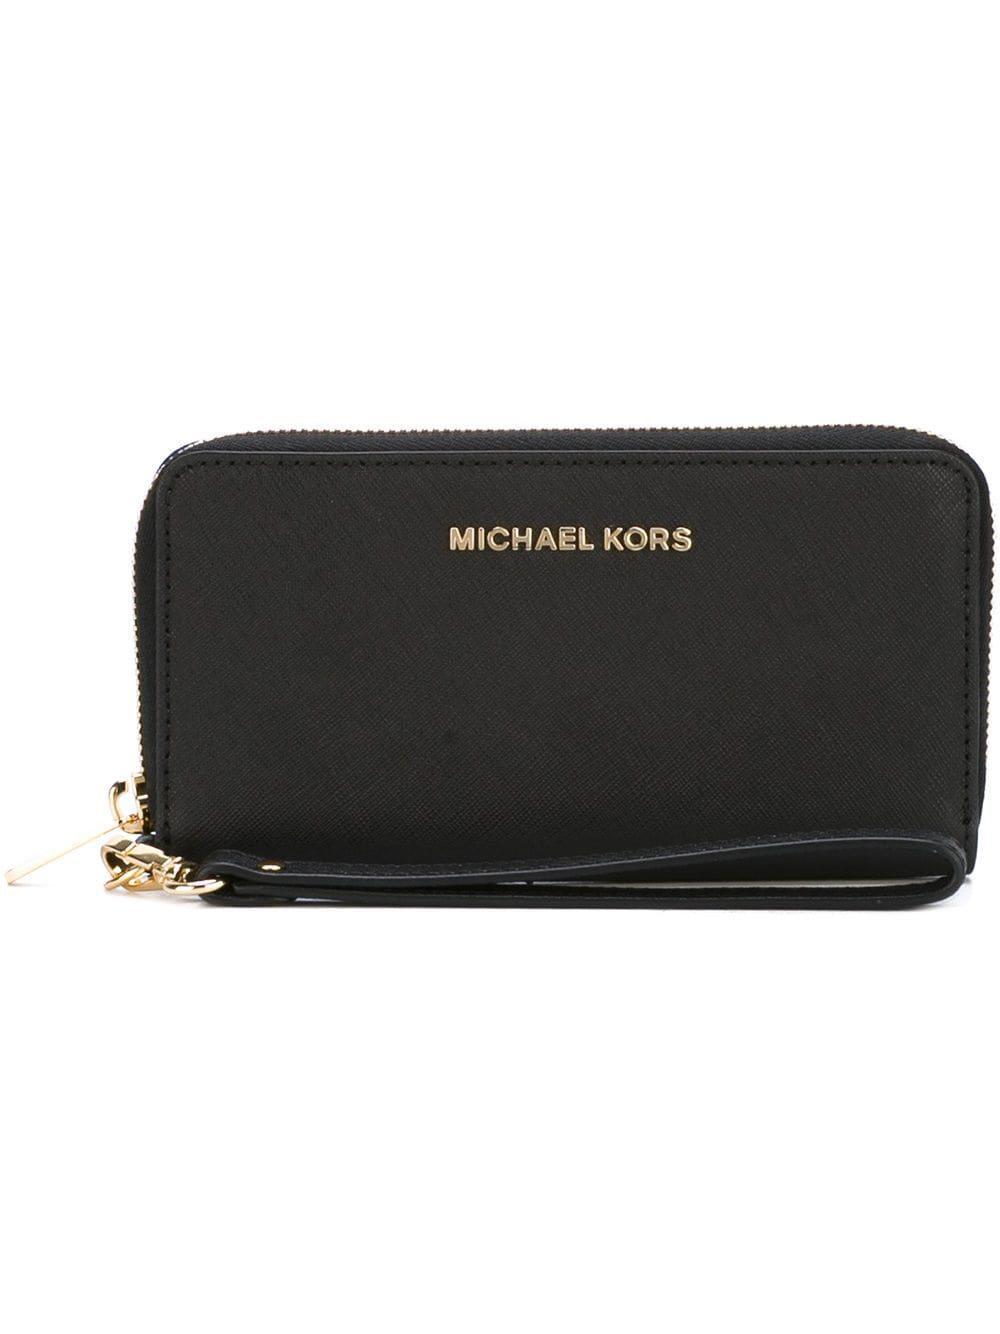 a7cd47892e6c Lyst - Michael Michael Kors Leather Wristlet Pouch in Black